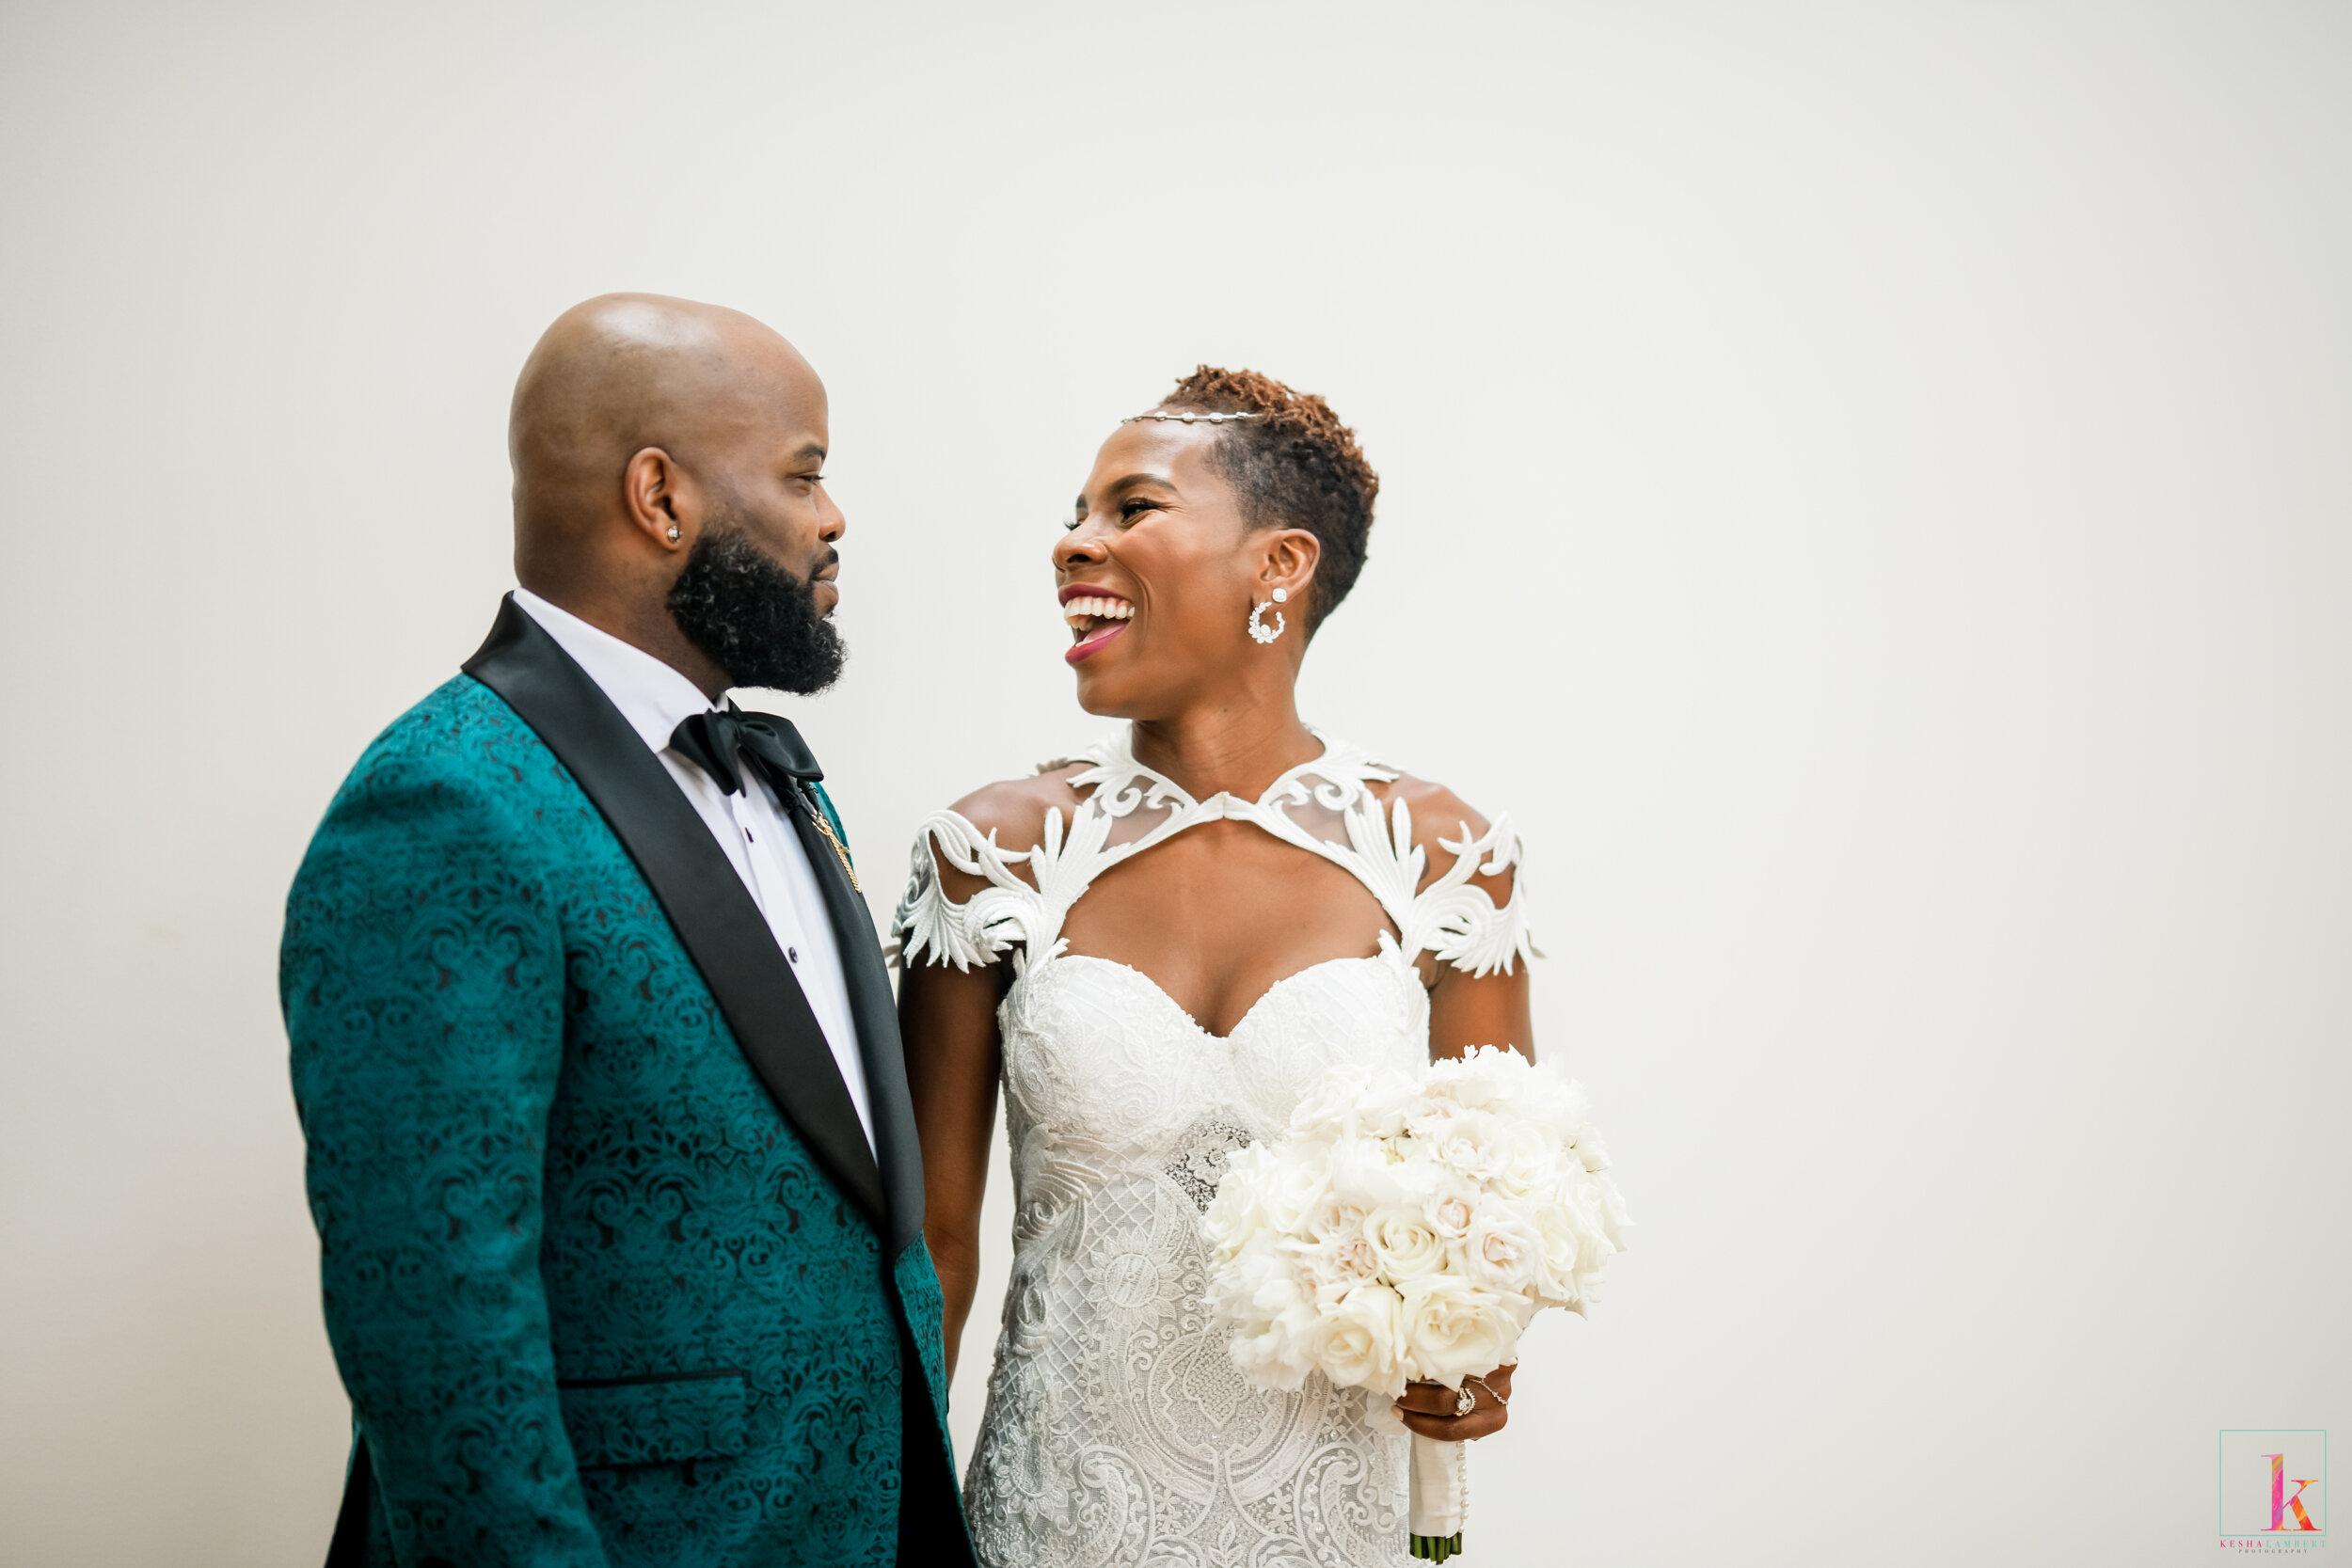 Luvvie Ajayi and Carnell Jones Wedding Celebration